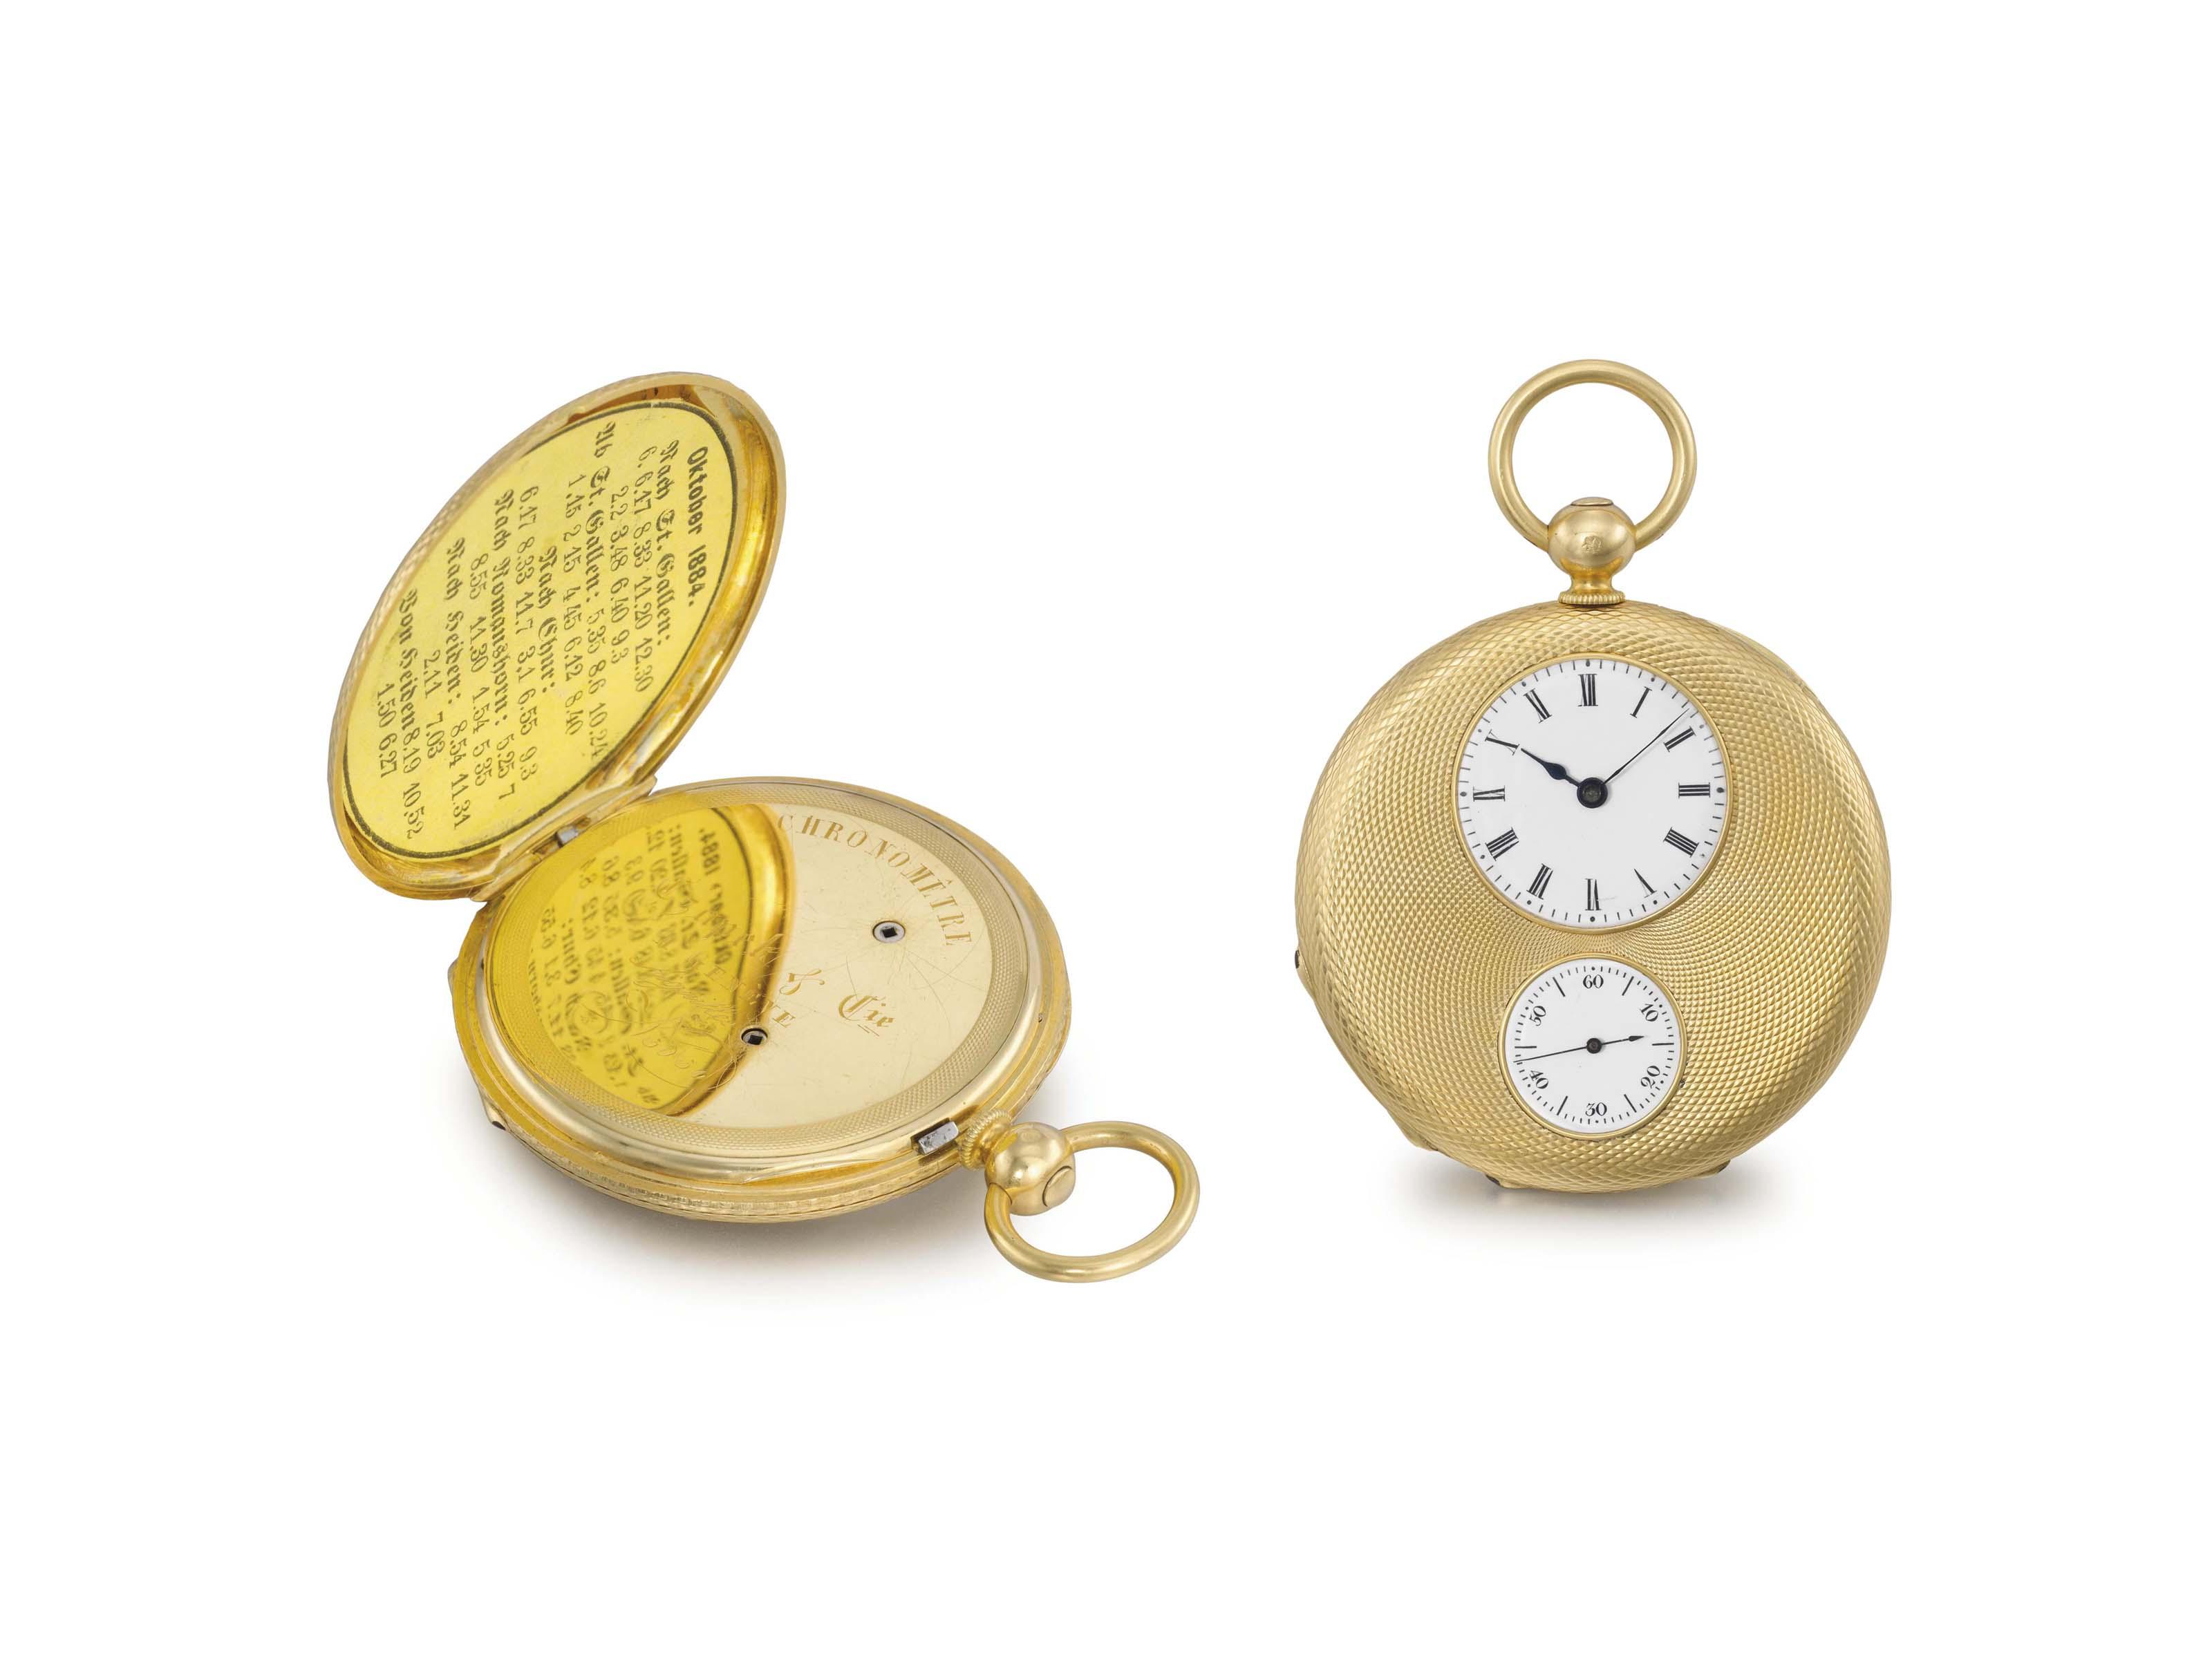 Czapek & Cie. A fine and rare 18K gold half-hunter case keywound pocket chronometer